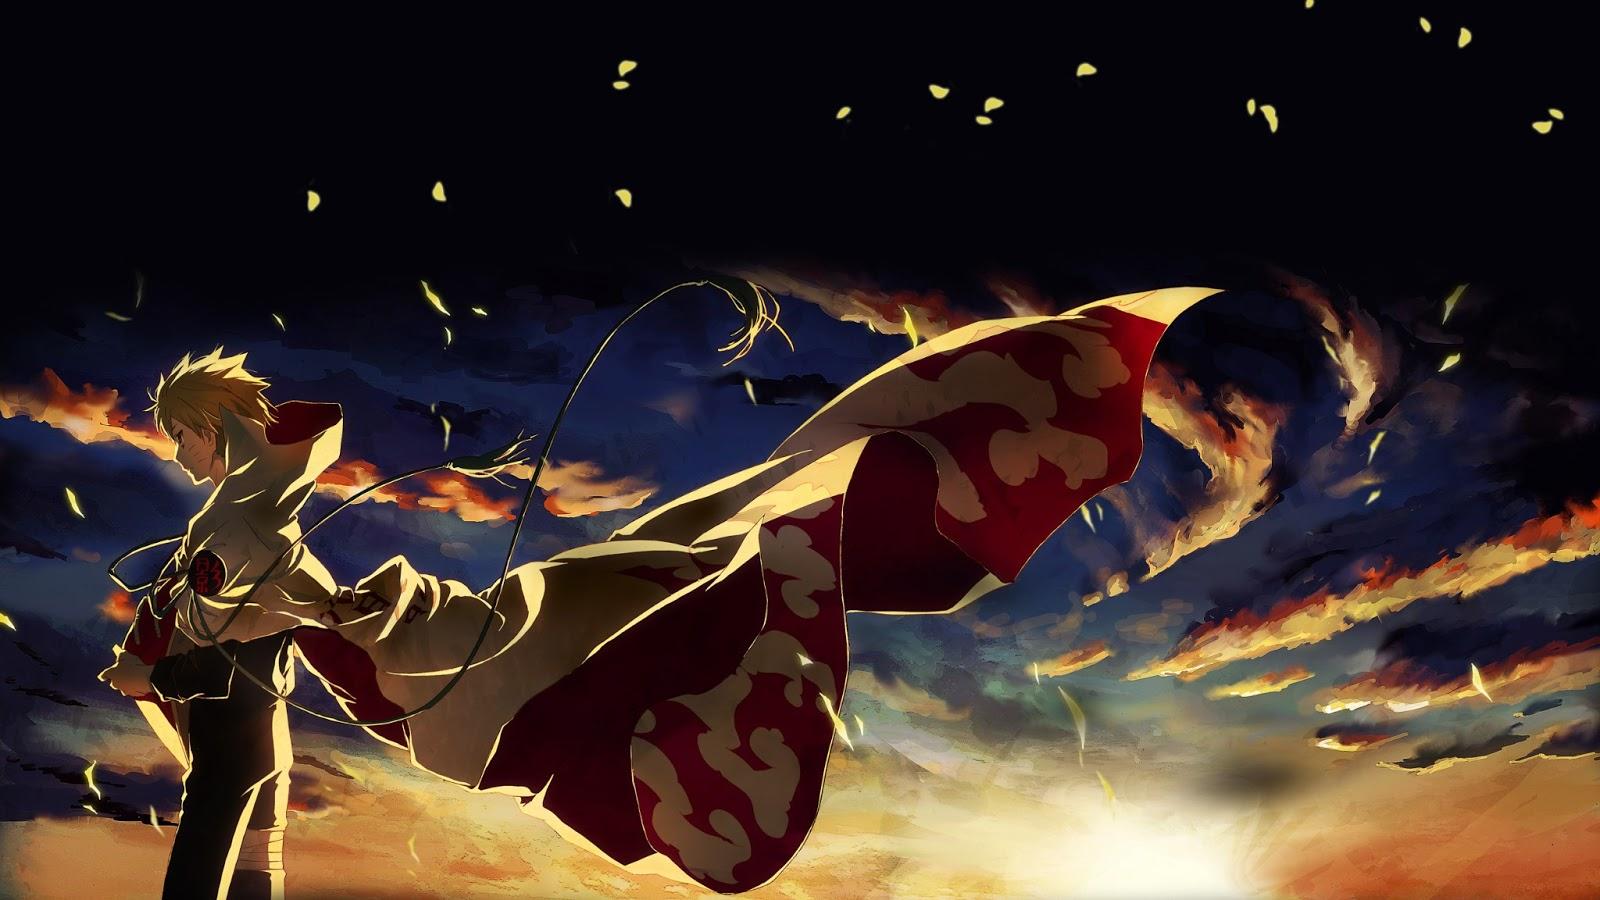 Wallpapers HD: Naruto Y Naruto Shippuden Wallpapers Full HD